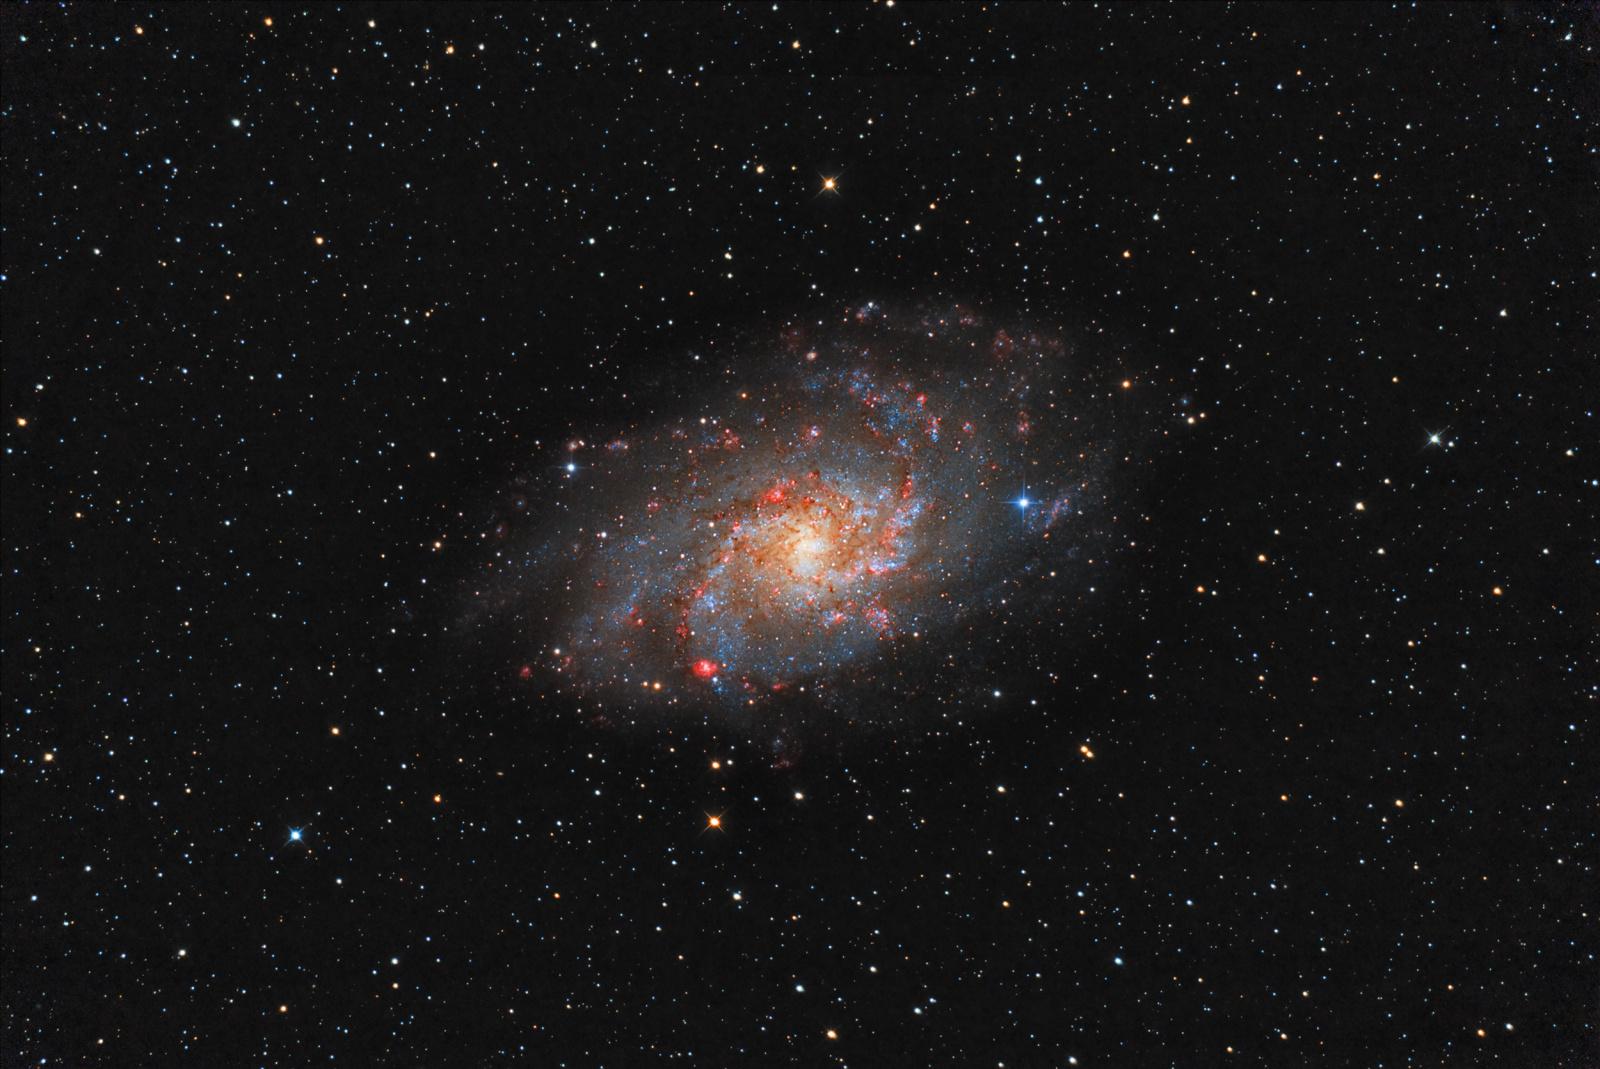 M33_nowa_astropolis.jpg